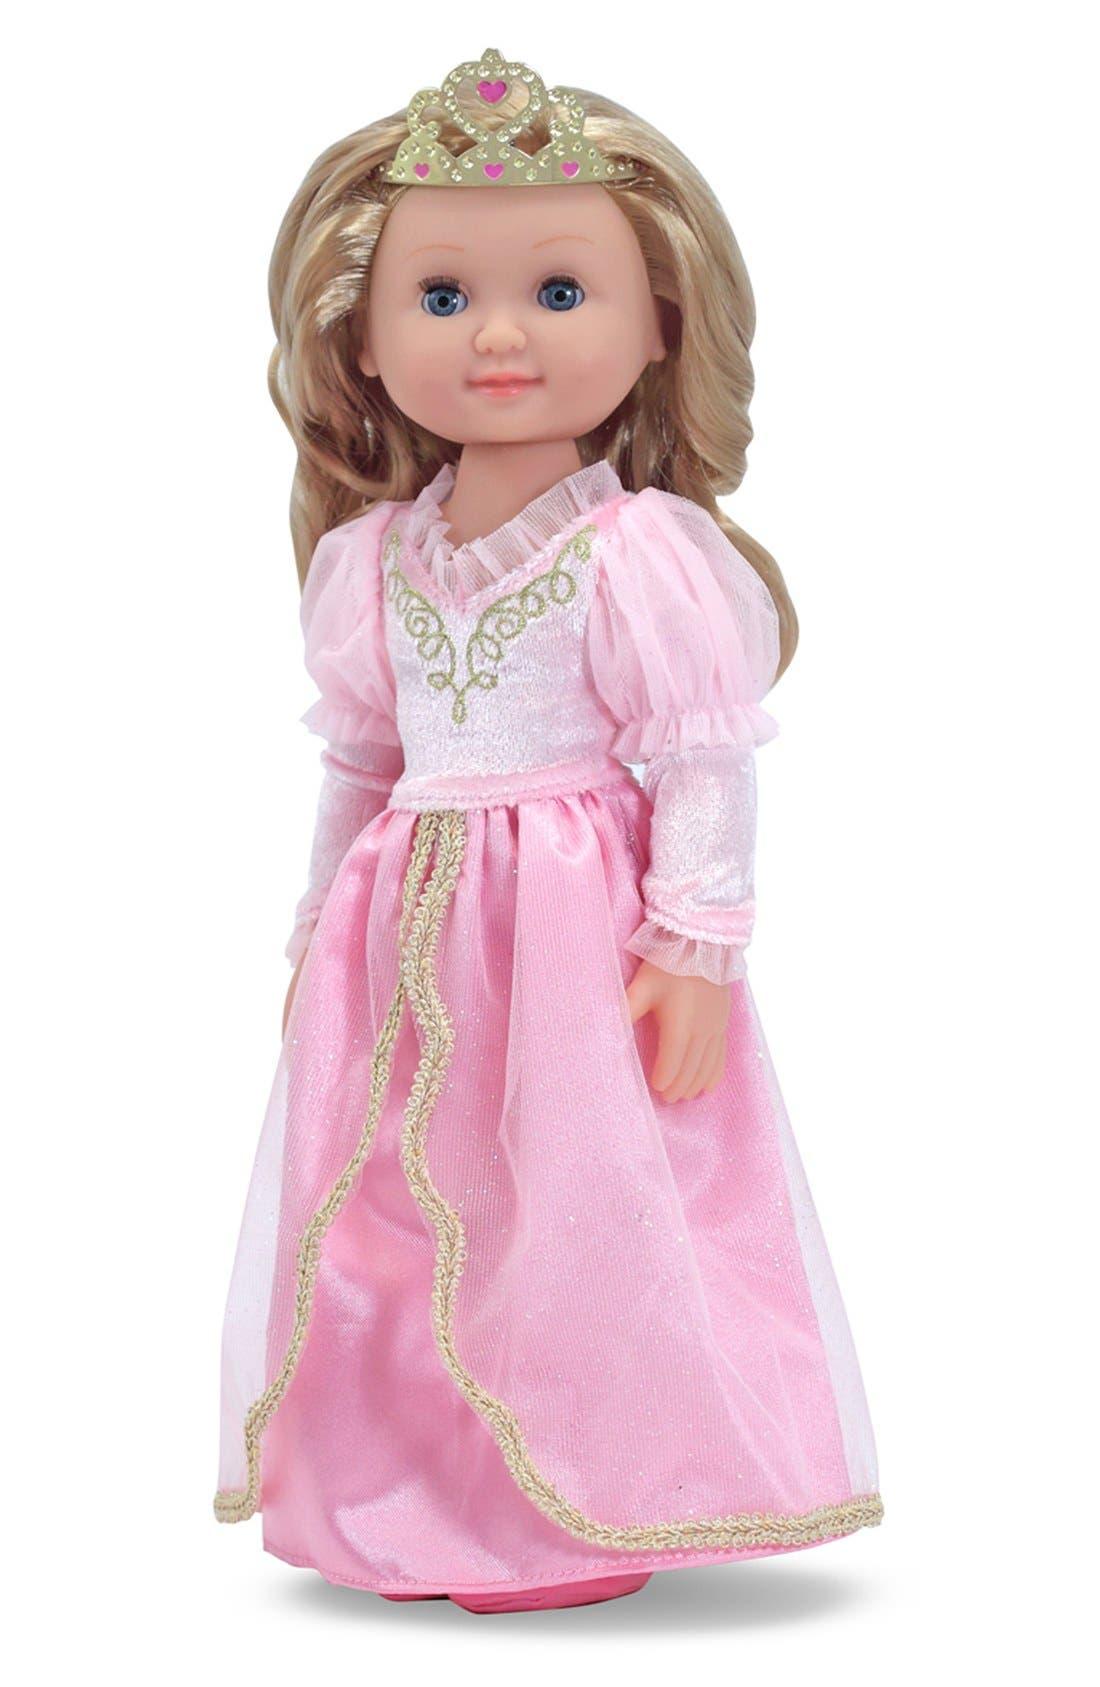 Melissa & Doug 'Mine to Love - Celeste' Princess Doll